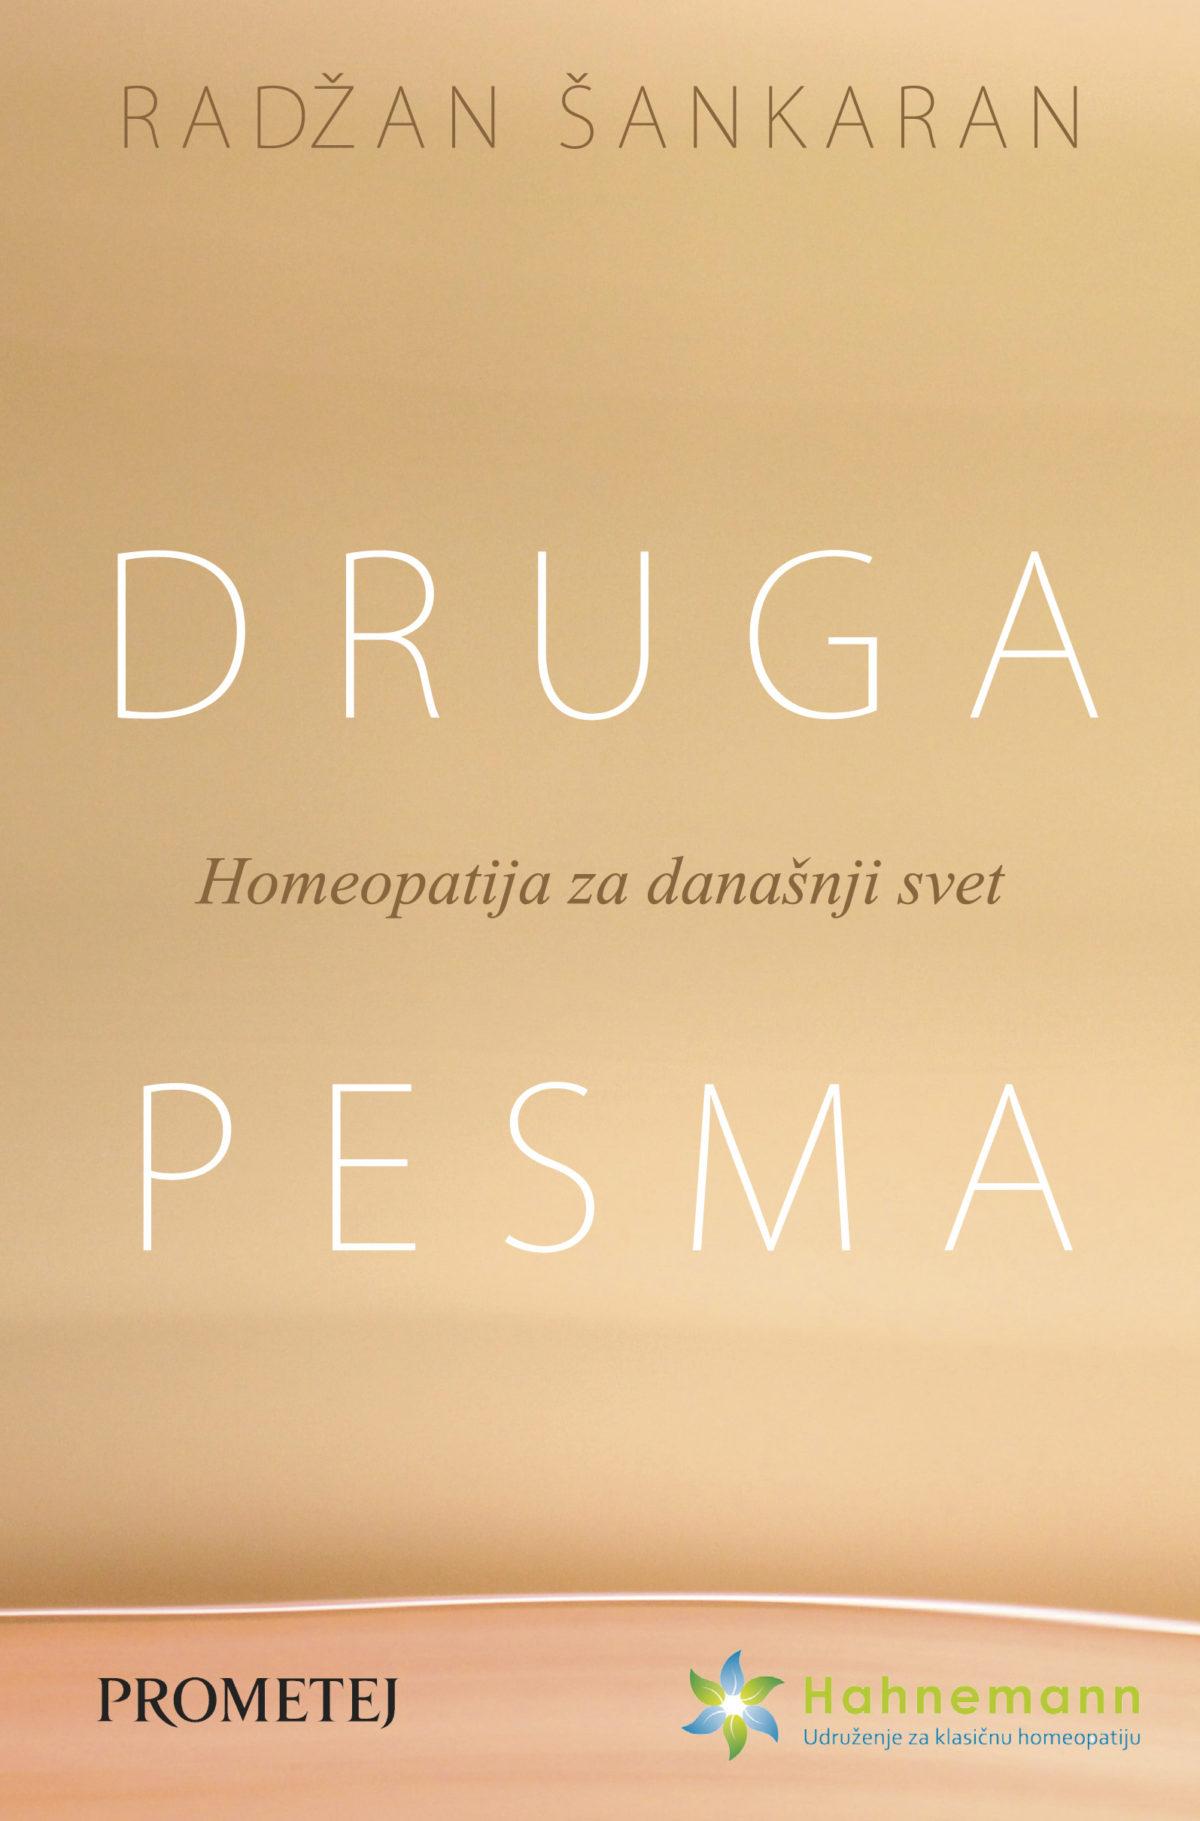 DRUGA PESMA Homeopatija za današnji svet